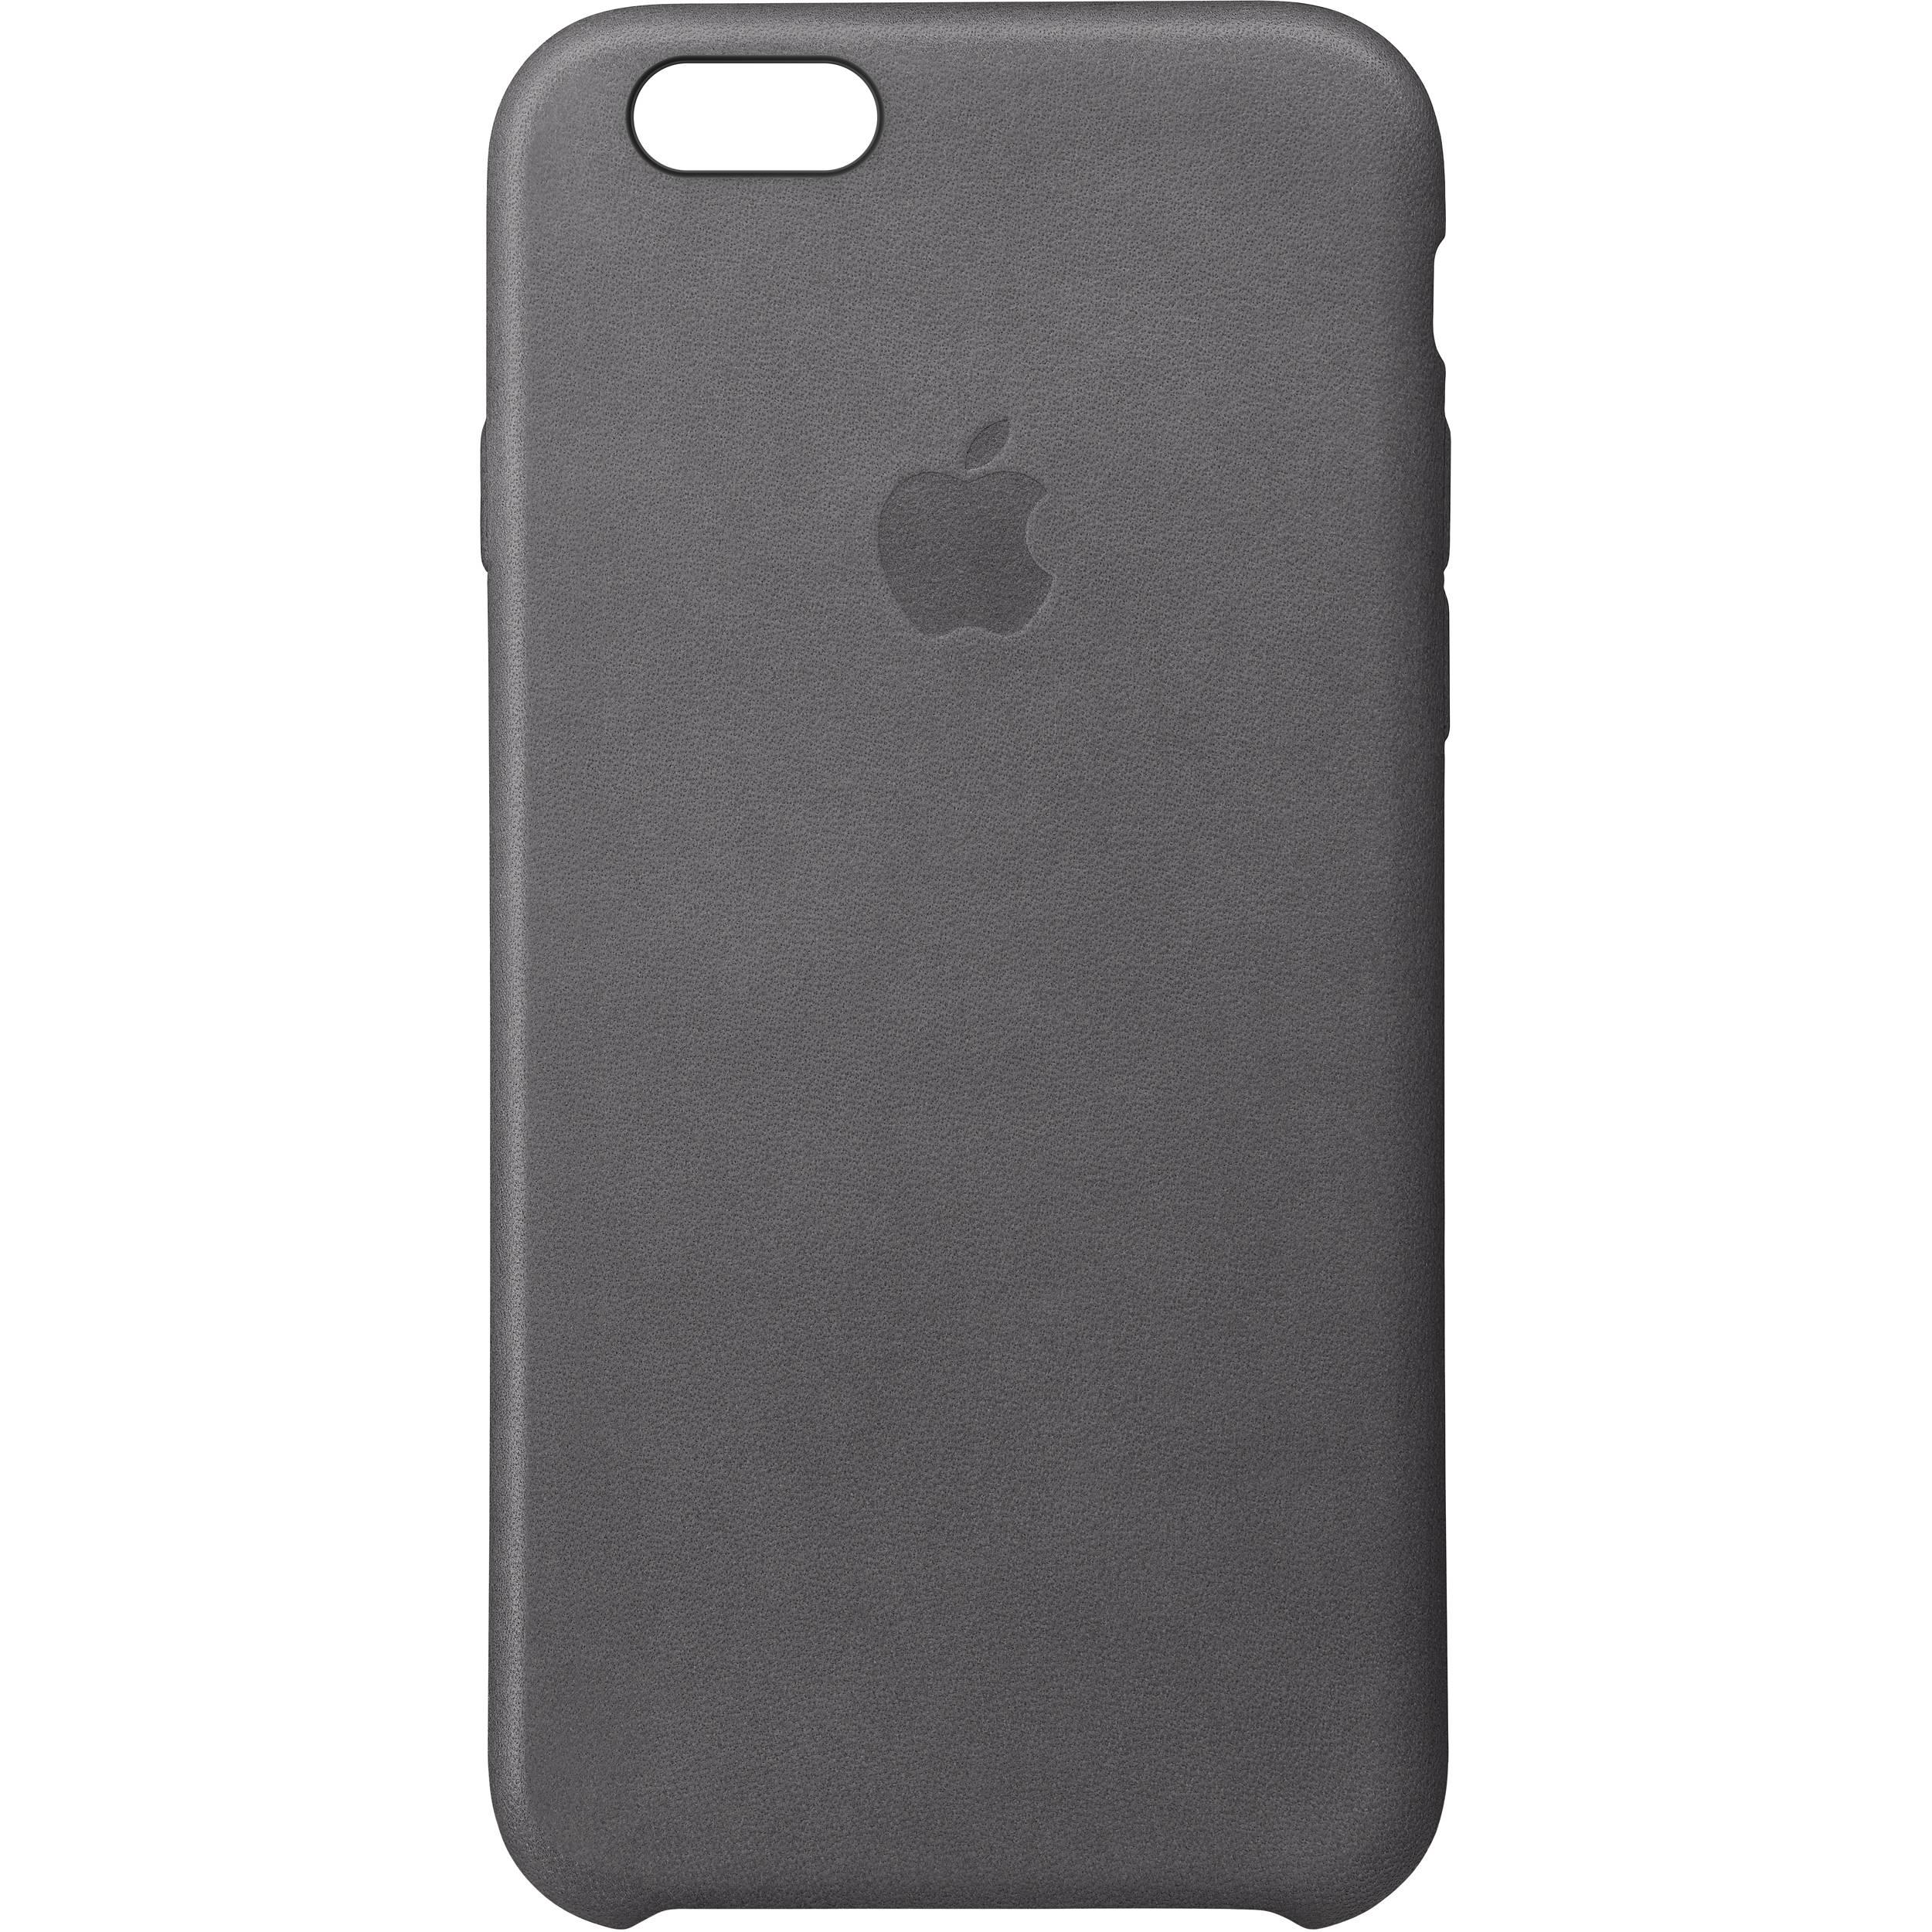 designer fashion 92957 05d61 Apple iPhone 6/6s Leather Case (Storm Gray)